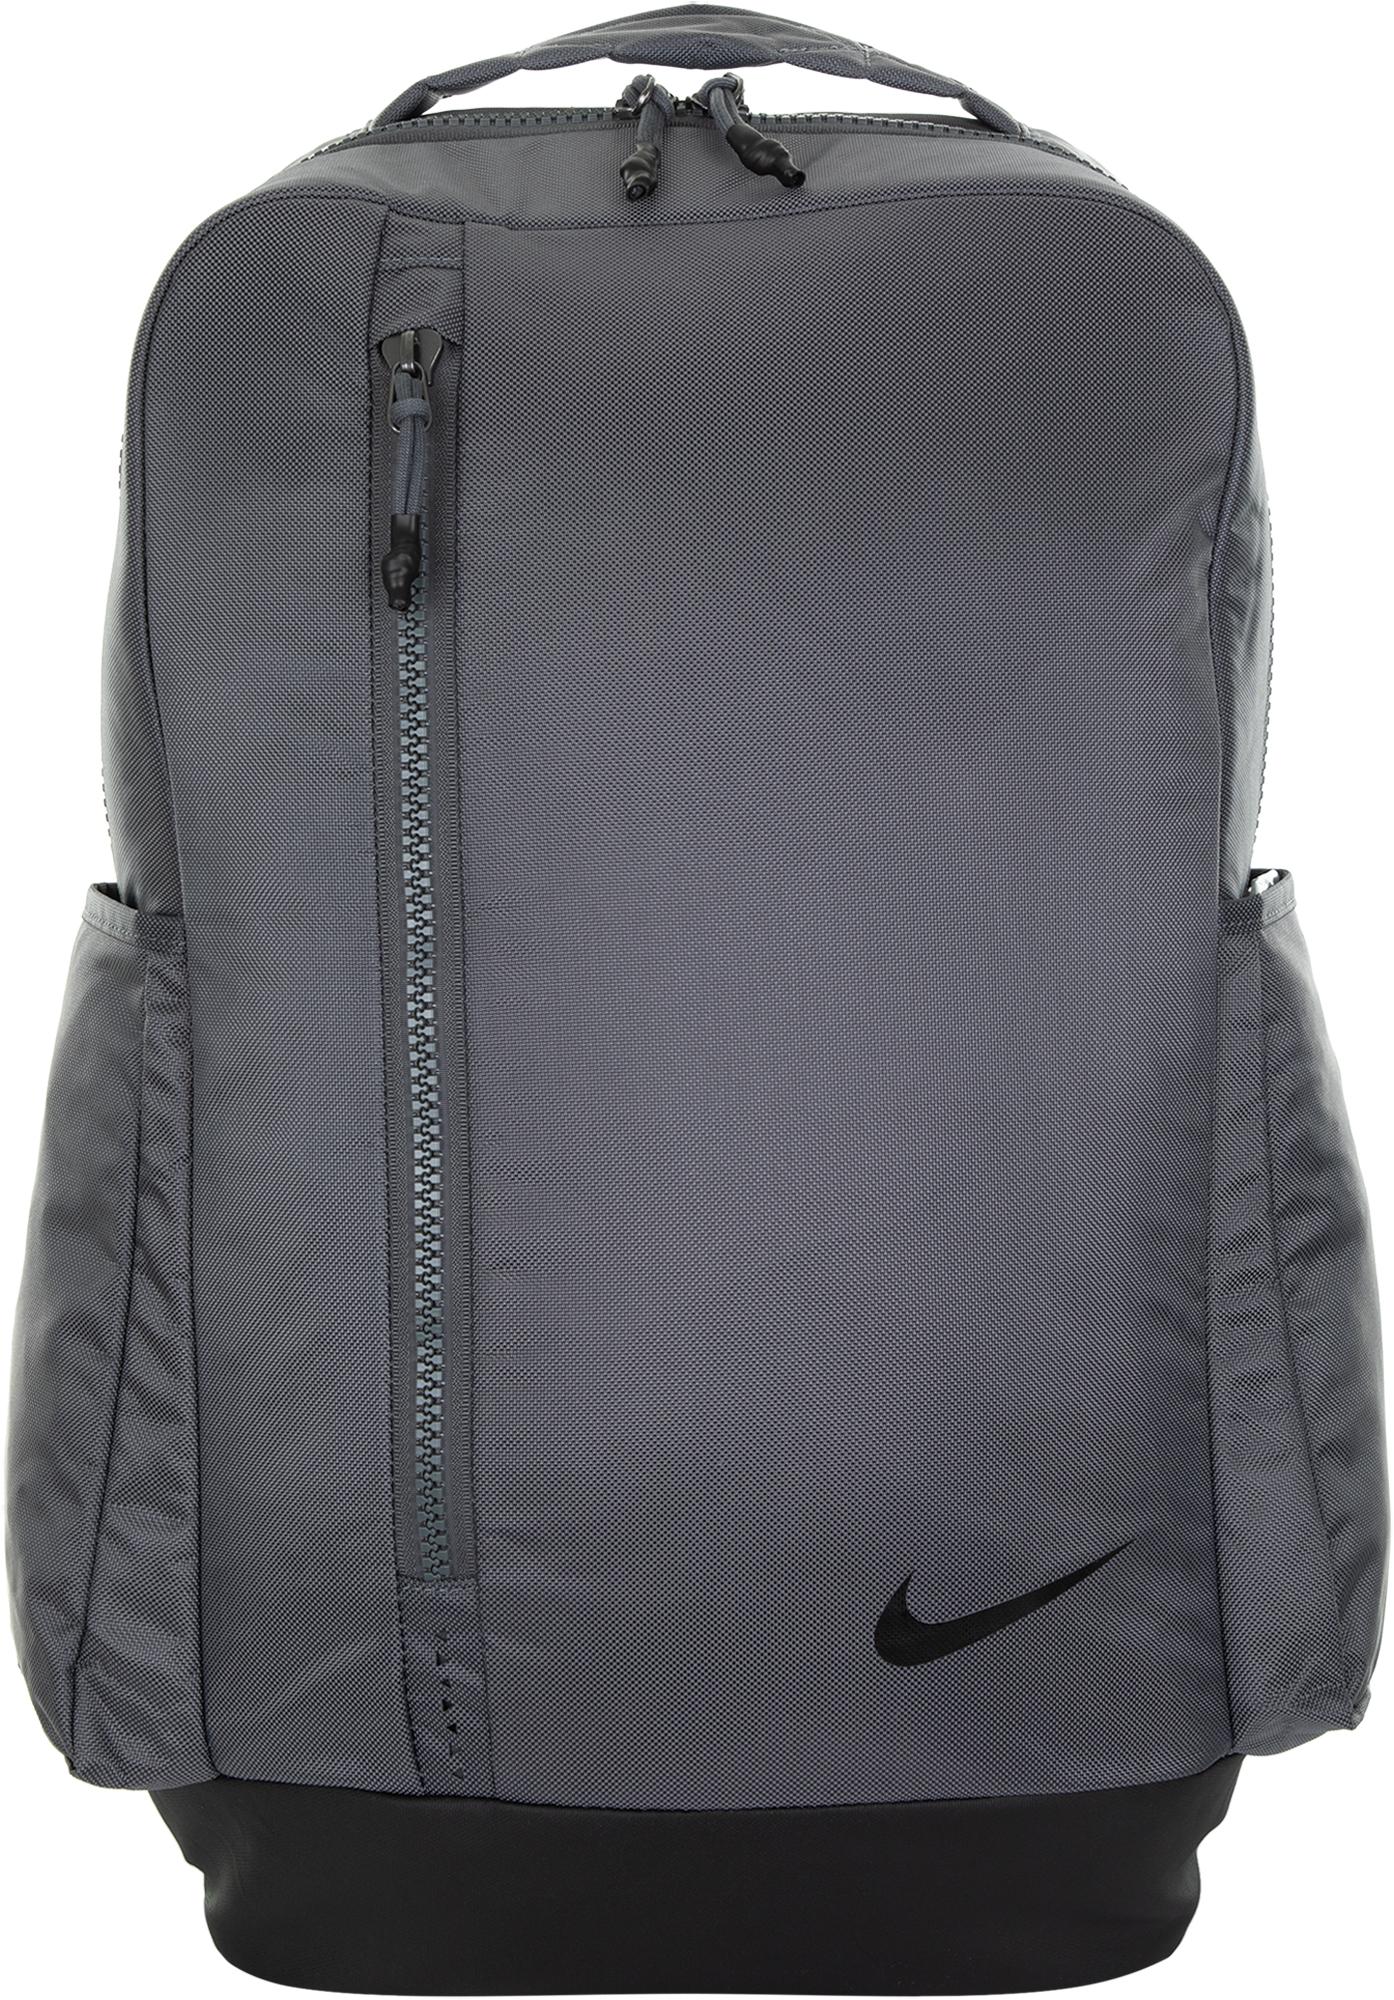 купить Nike Рюкзак Nike Vapor Power 2.0 дешево